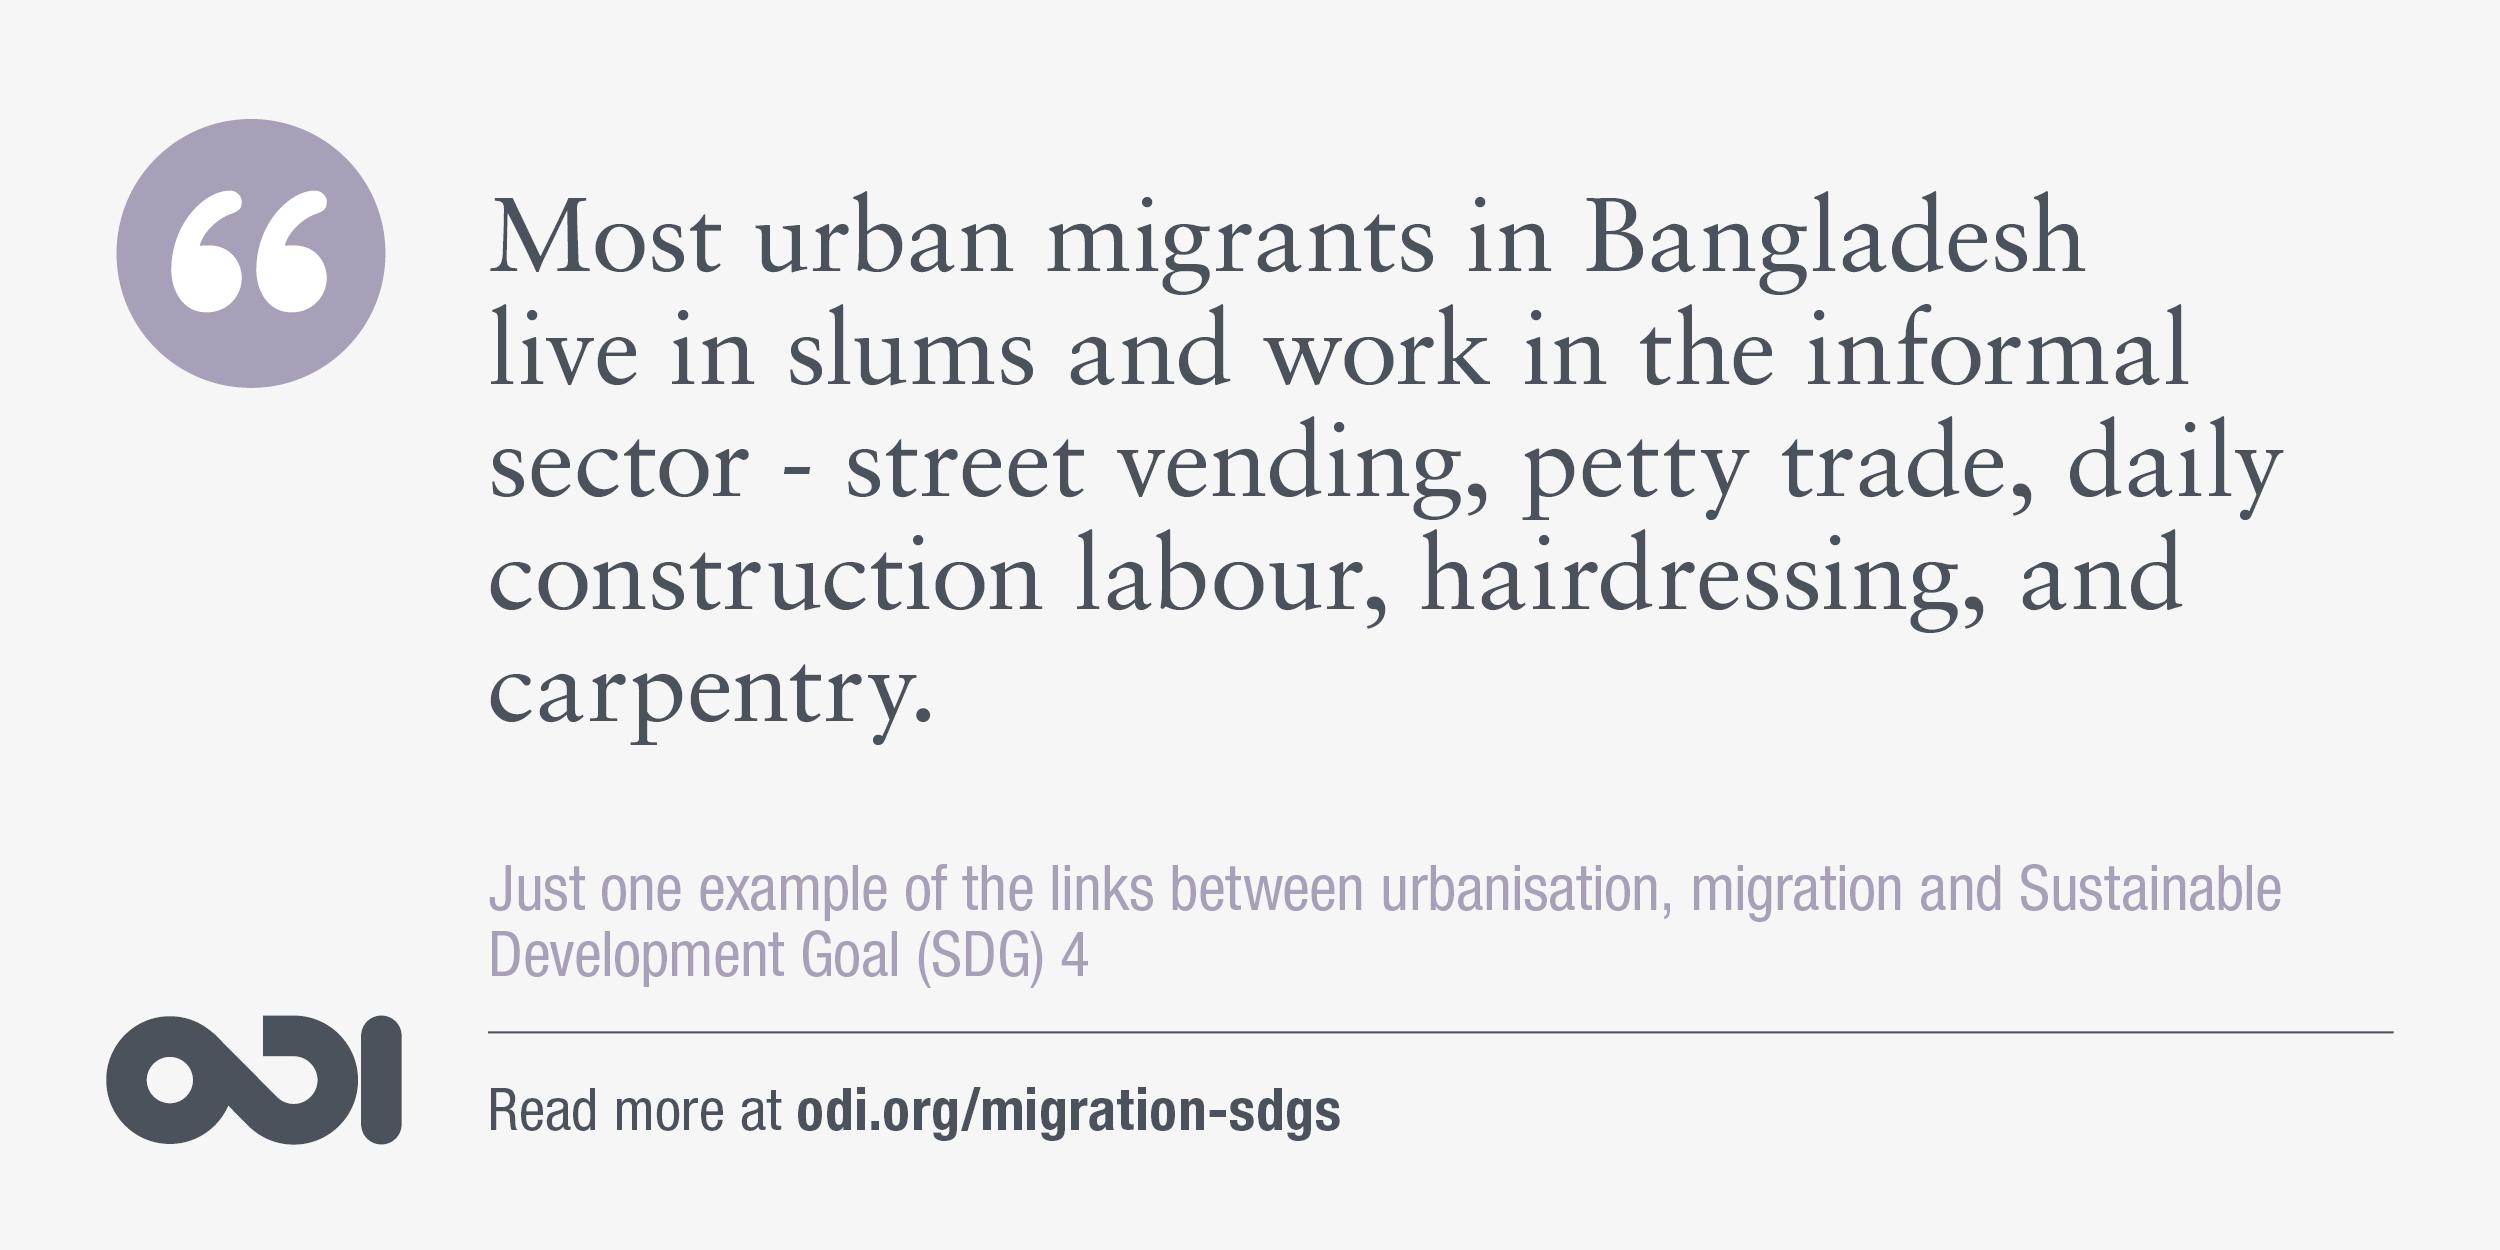 The links between urbanisation, migration and SDG 4.